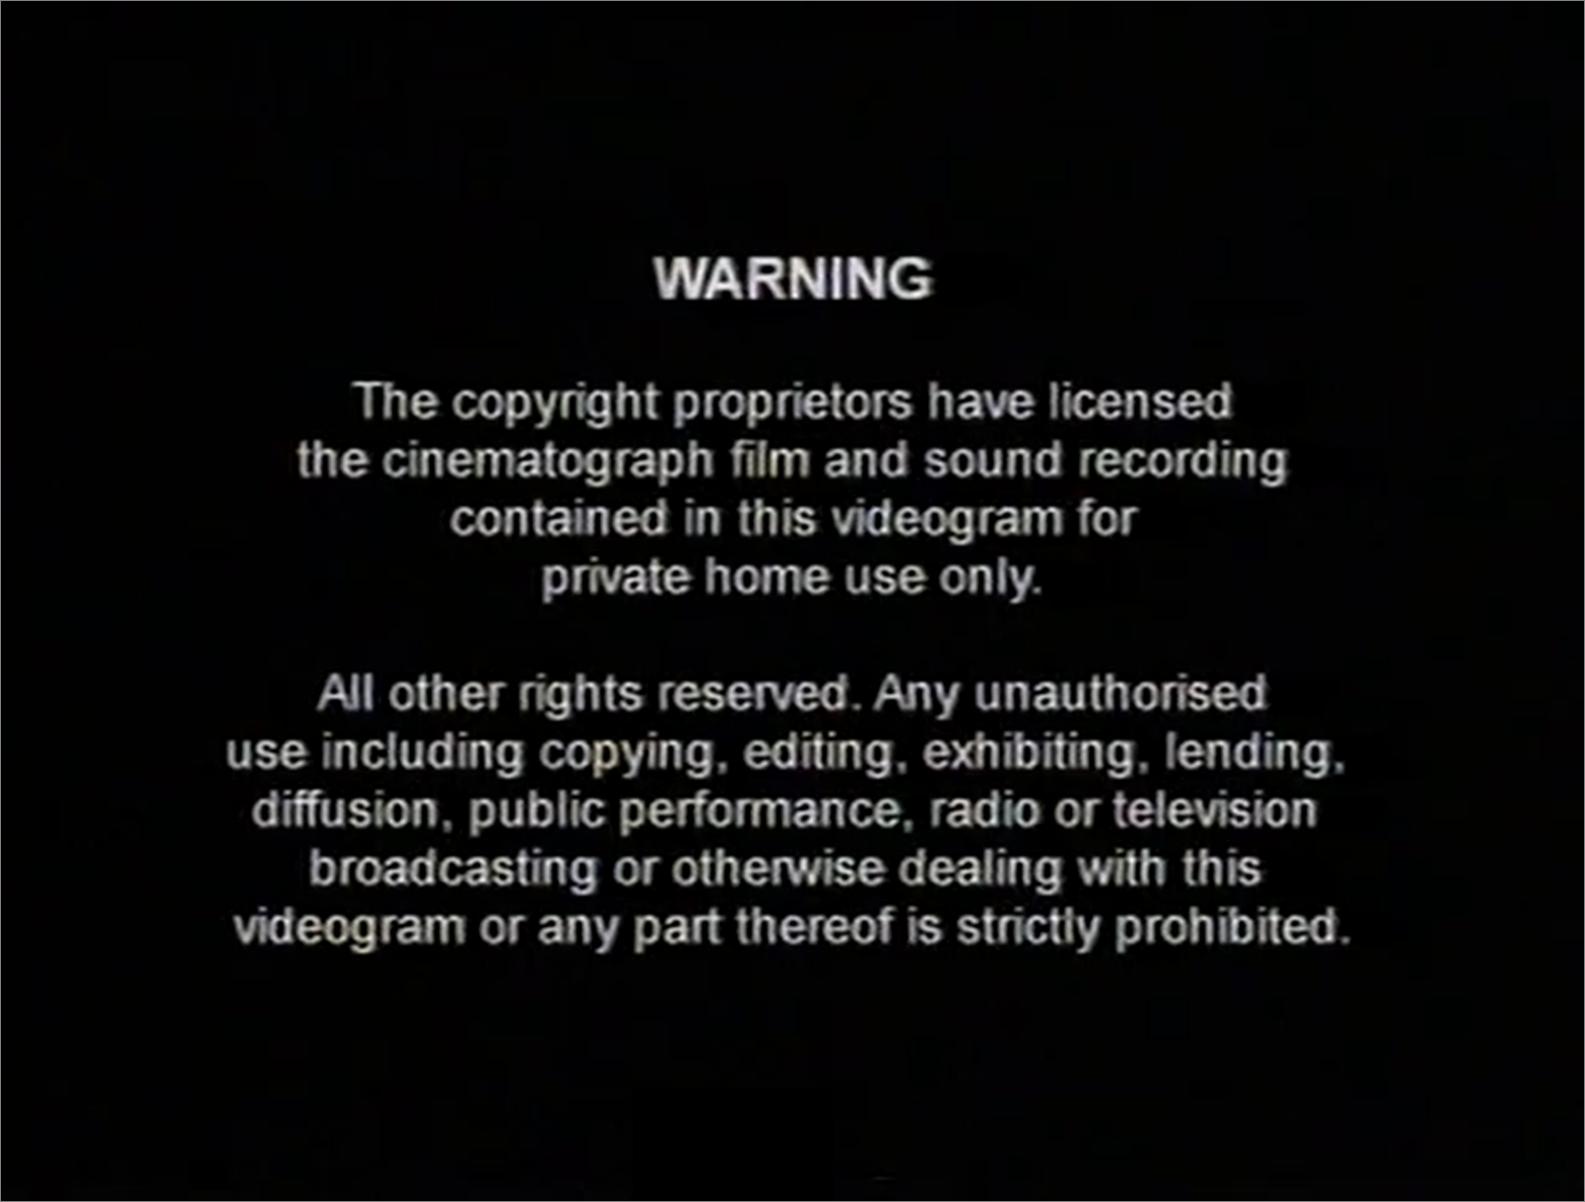 Image Universal Warning Variant 2000 Png The Fbi